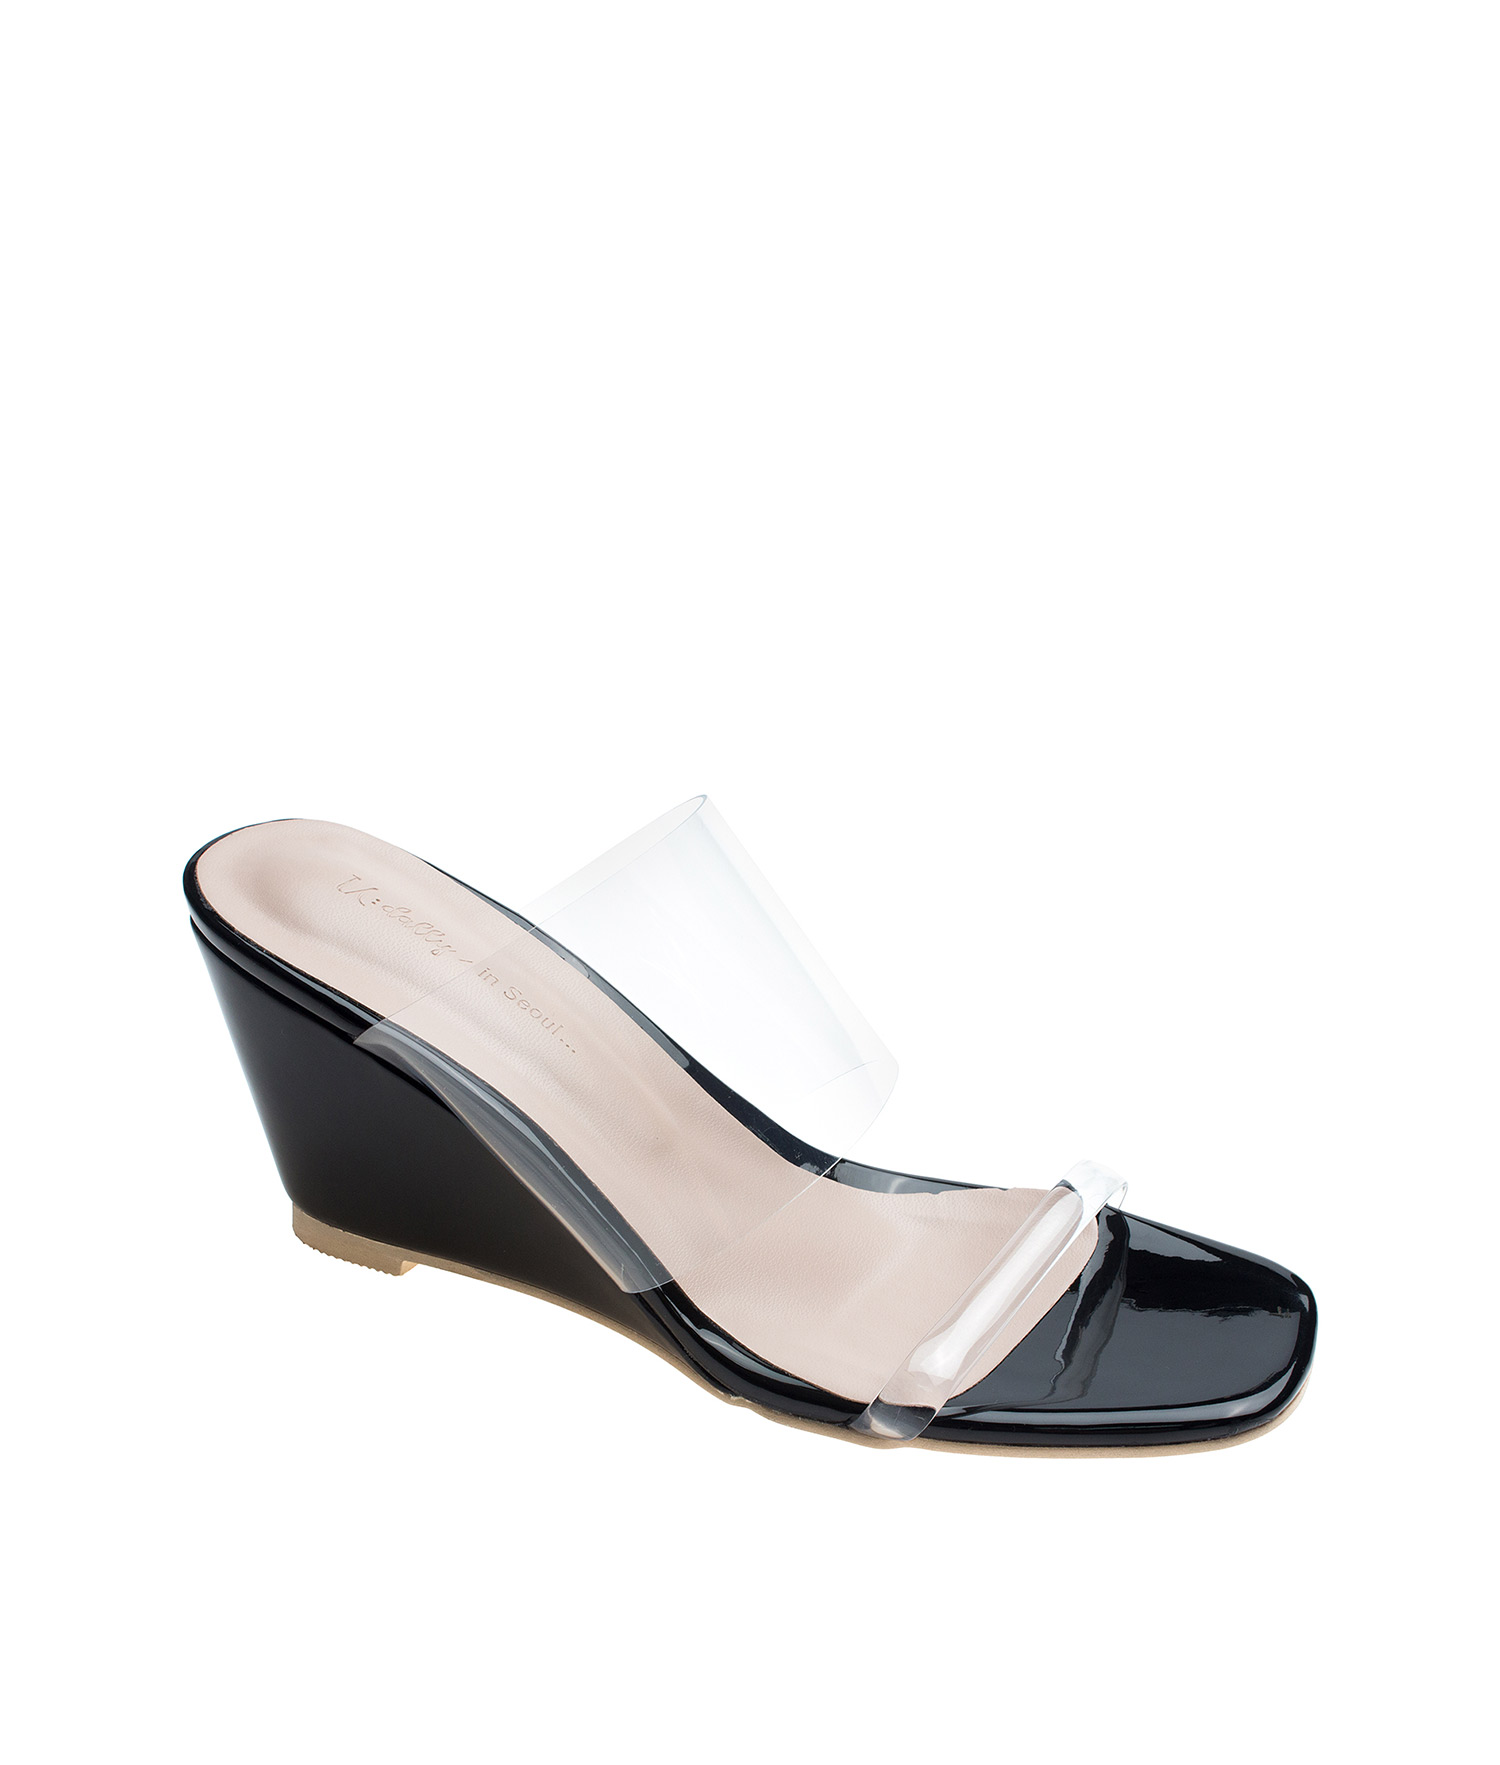 Women's Sandals   Flat & Wedge Sandals   Timberland